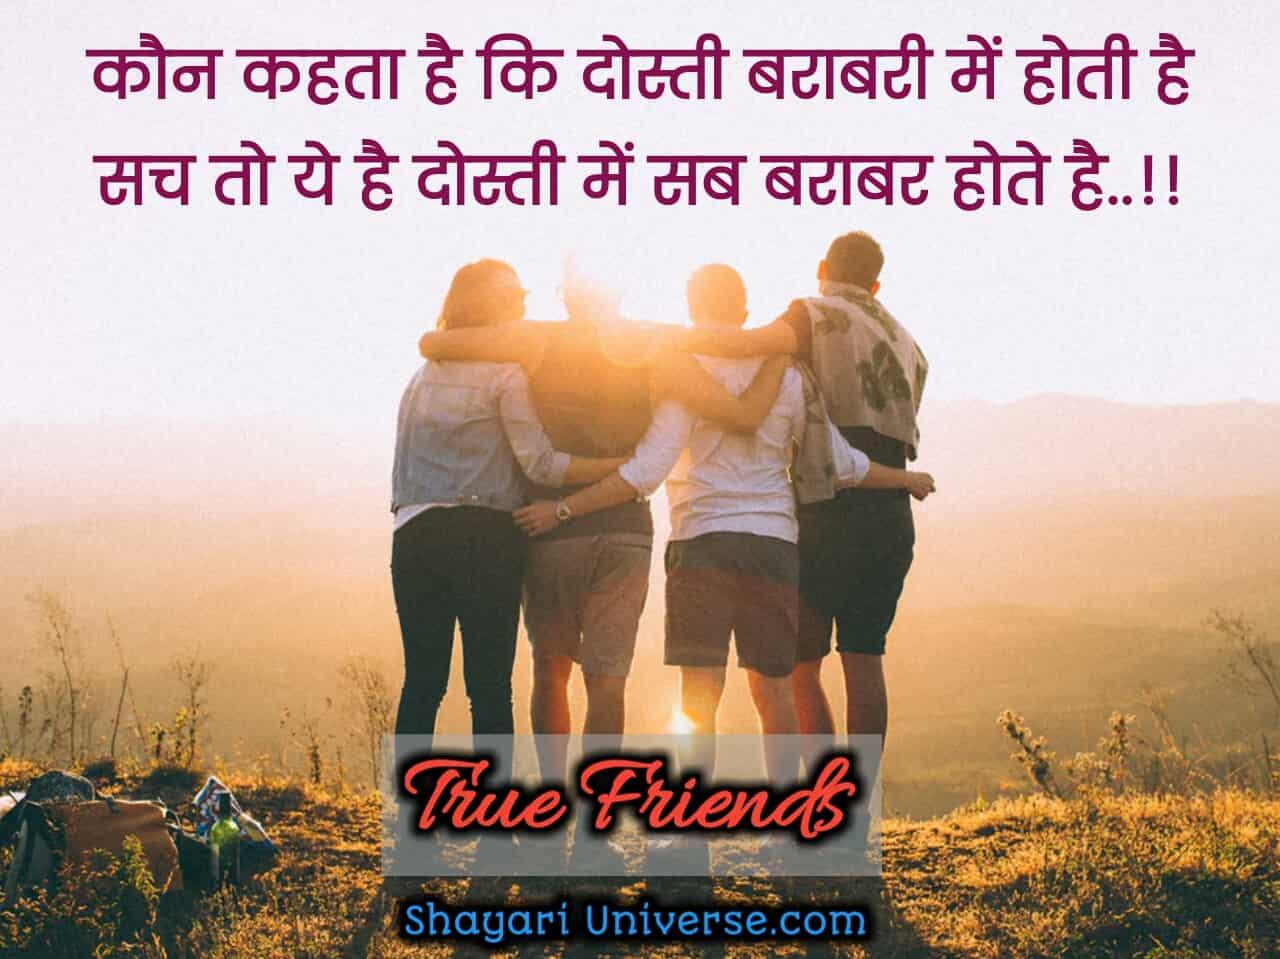 hindi friendship msg,hindi friendship msg